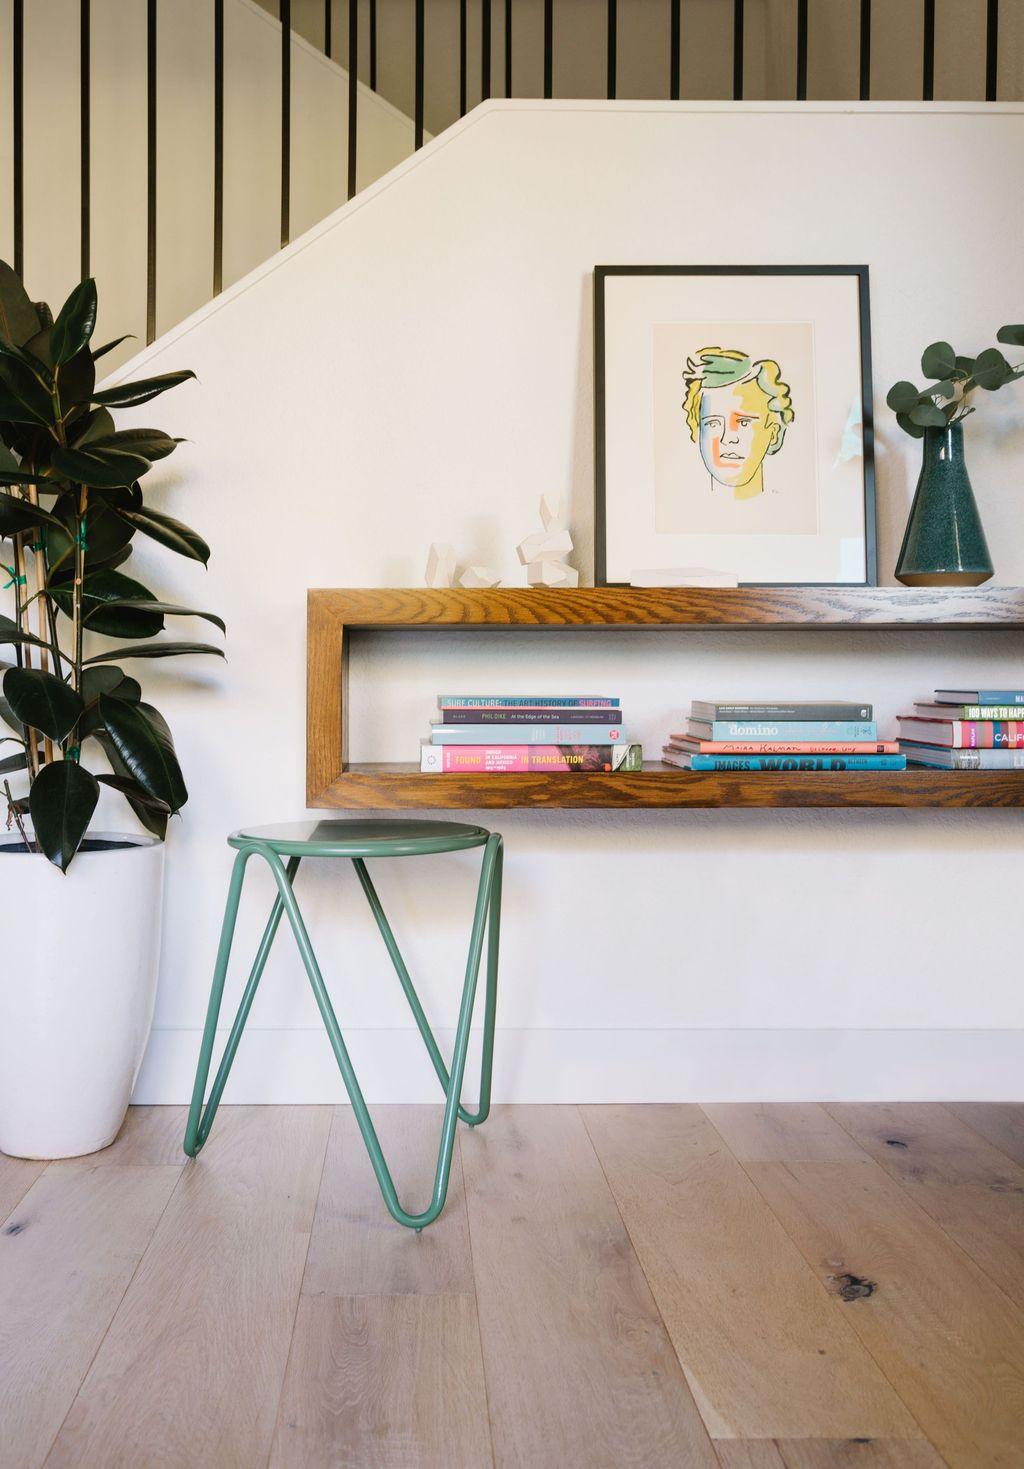 Inspiring Modern Home Furnishings Design Ideas 26